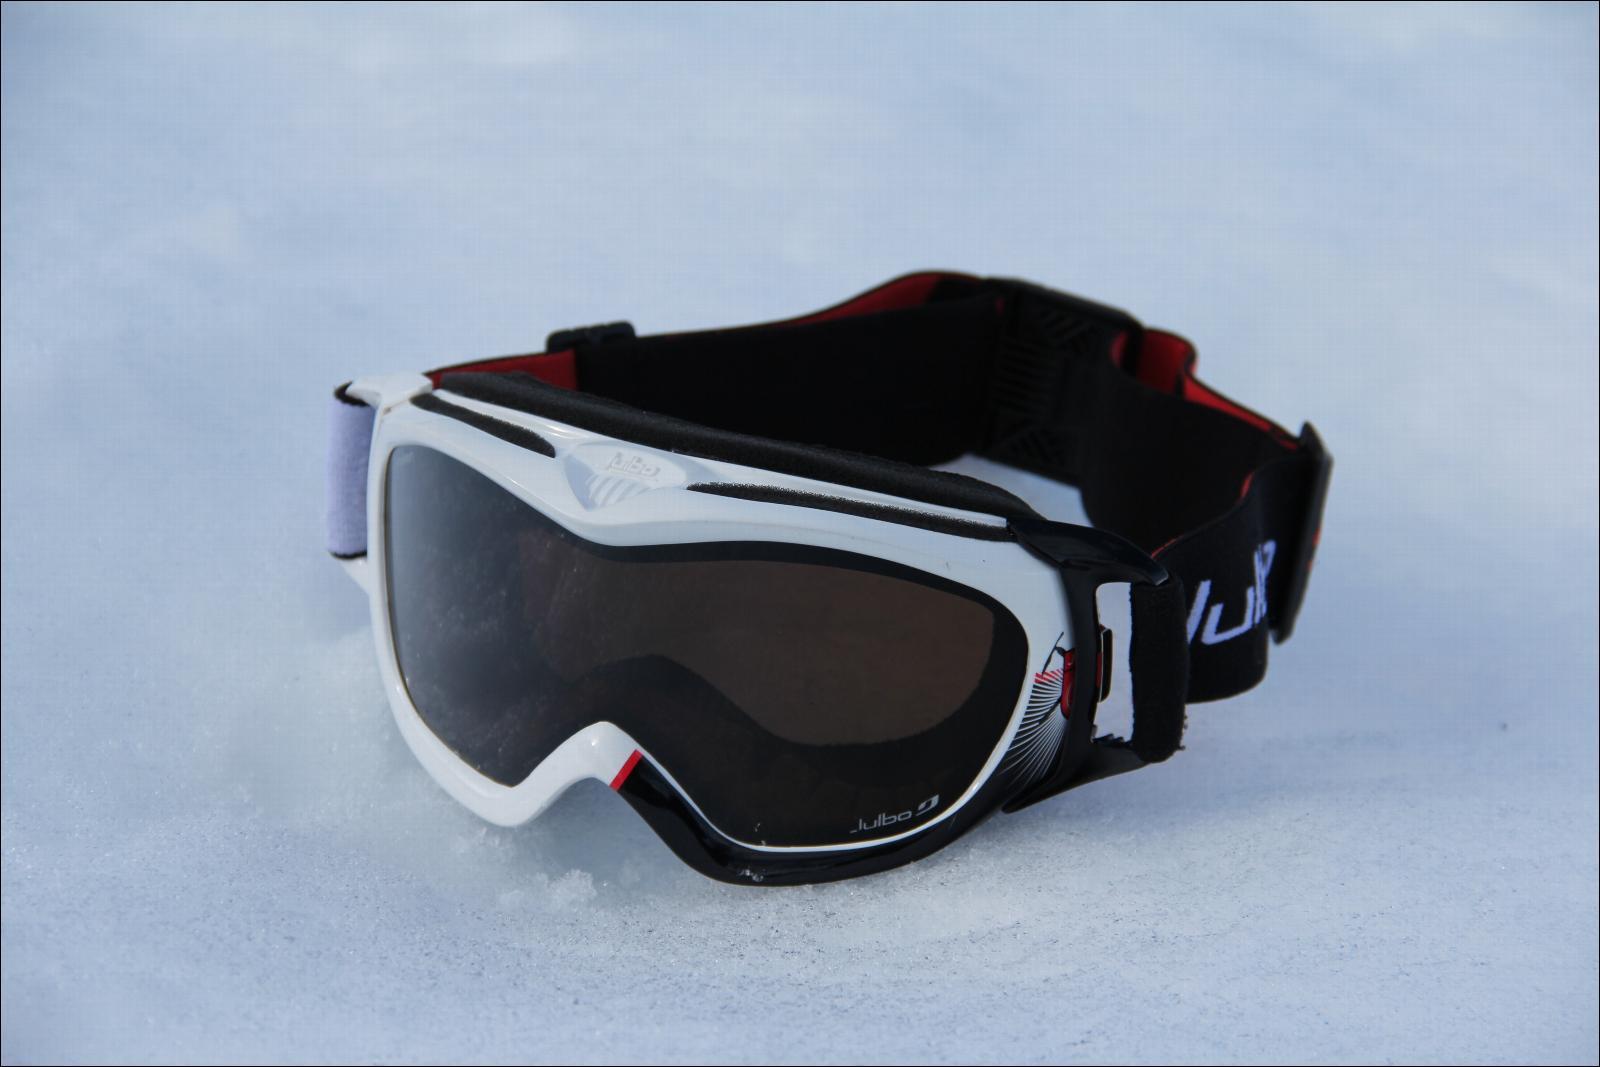 masque de ski julbo revolution ecran cameleon. Black Bedroom Furniture Sets. Home Design Ideas